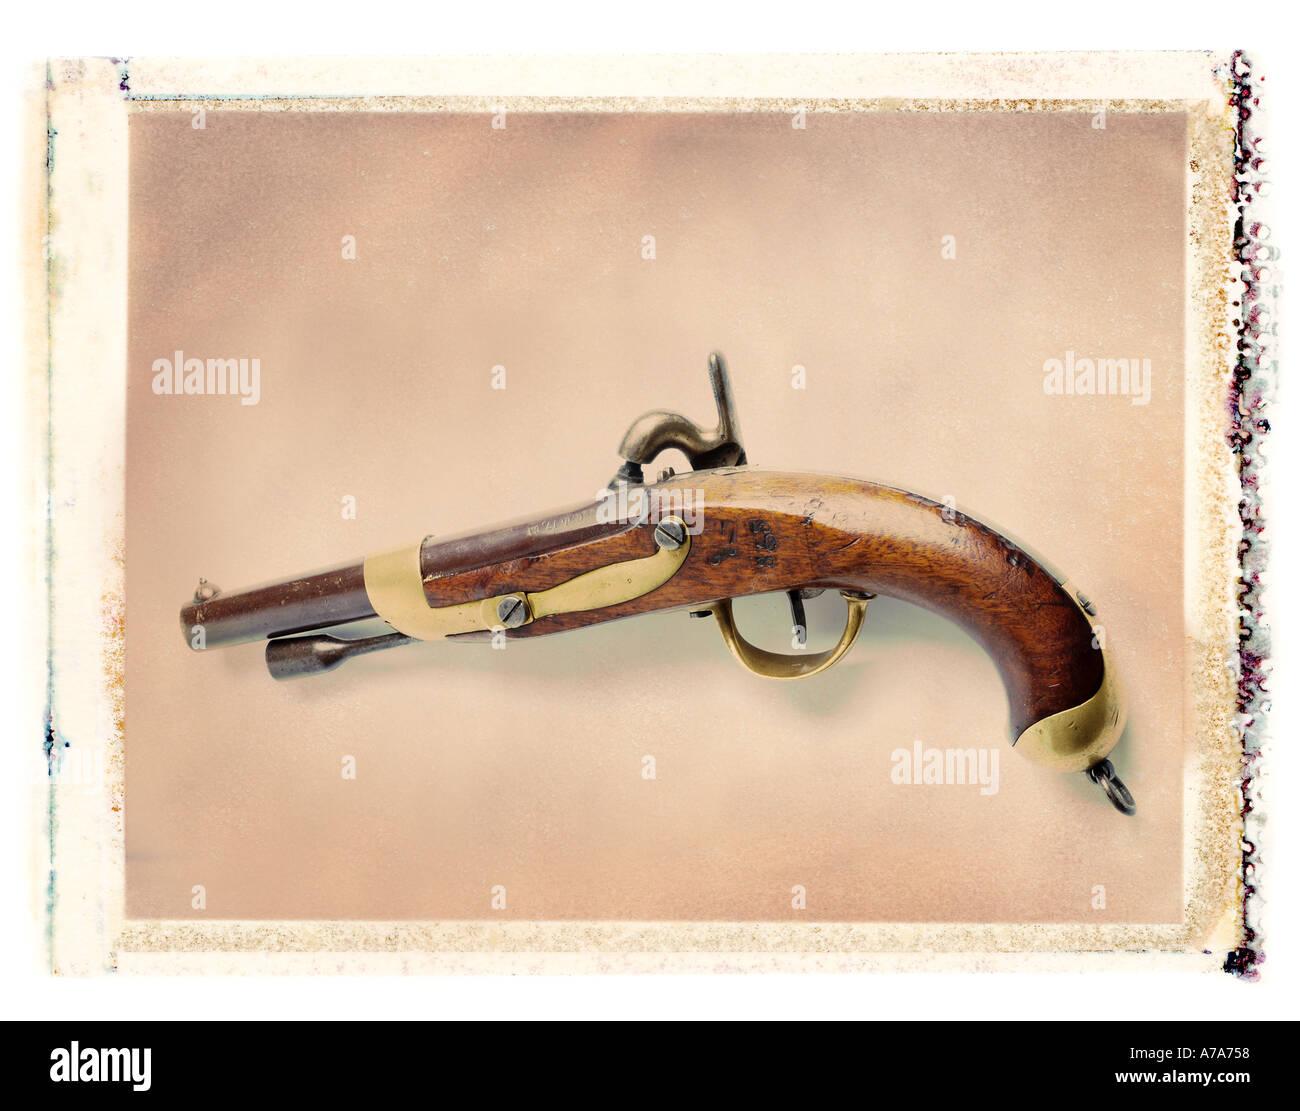 antique pistol - Stock Image